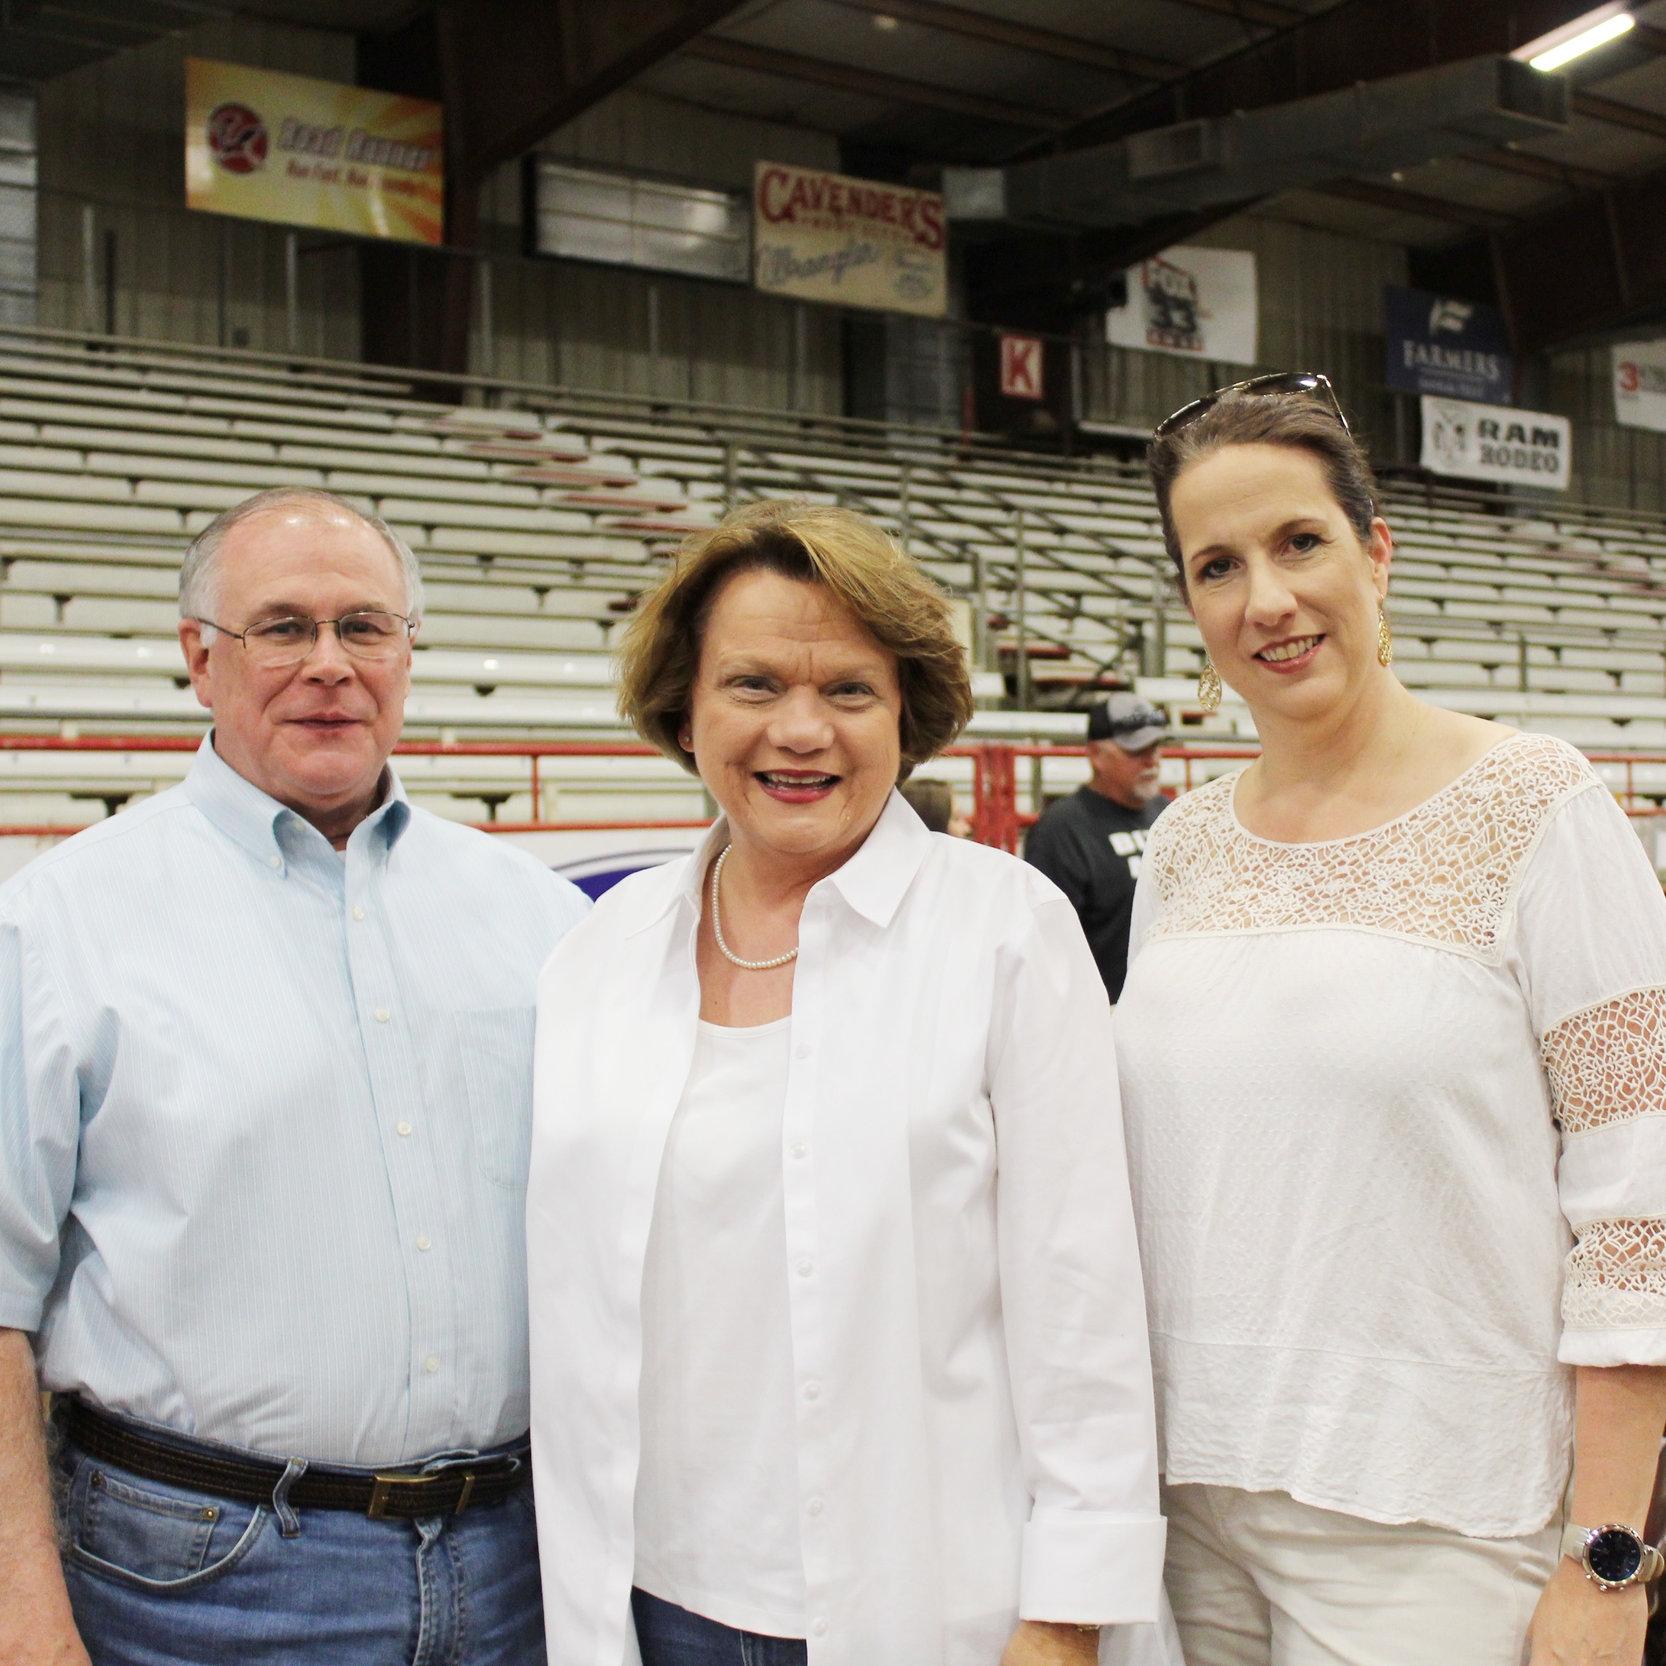 John and Rep. Carol Dalby with Lisa Shoalmire